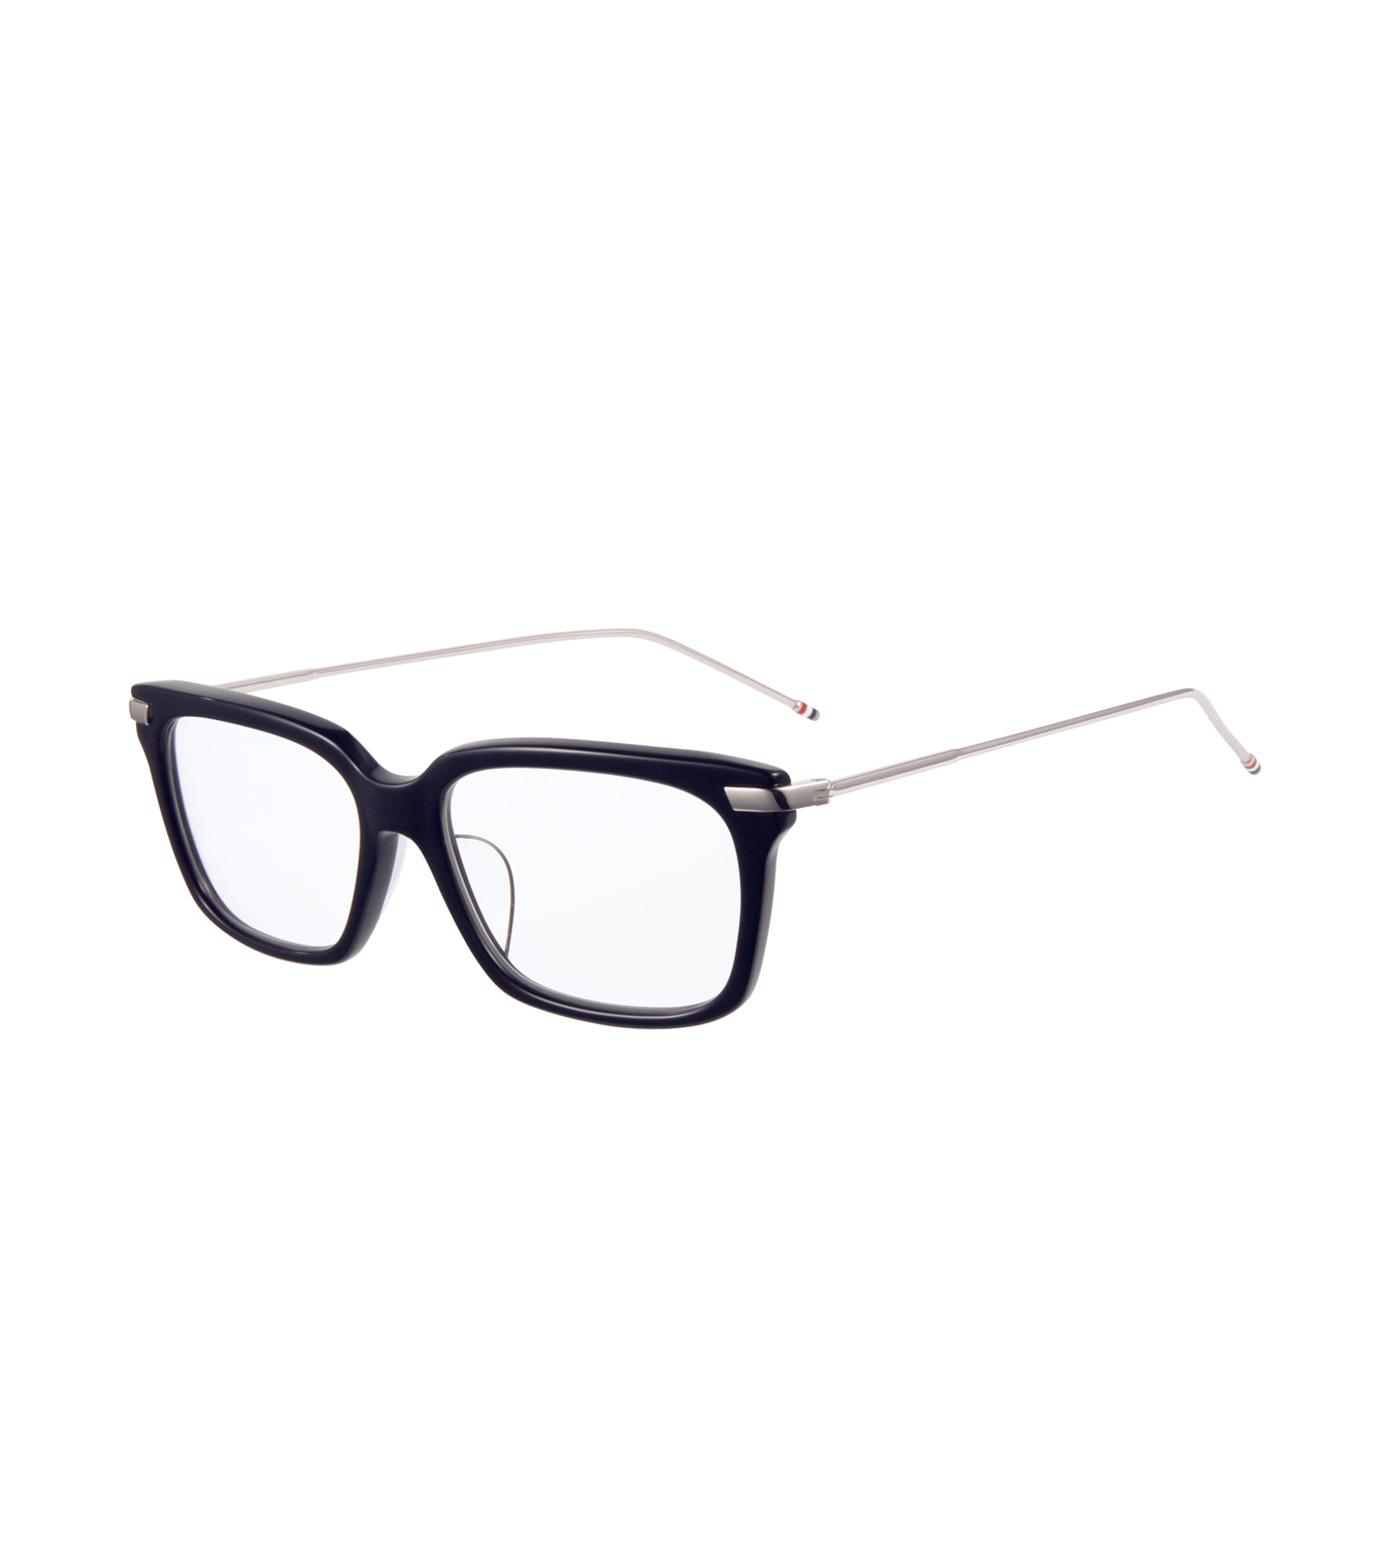 Thom Browne Eye Wear(トム・ブラウン・アイウェア)のWellington Clear Lens-NAVY(アイウェア/eyewear)-TB-701-H-93 拡大詳細画像1